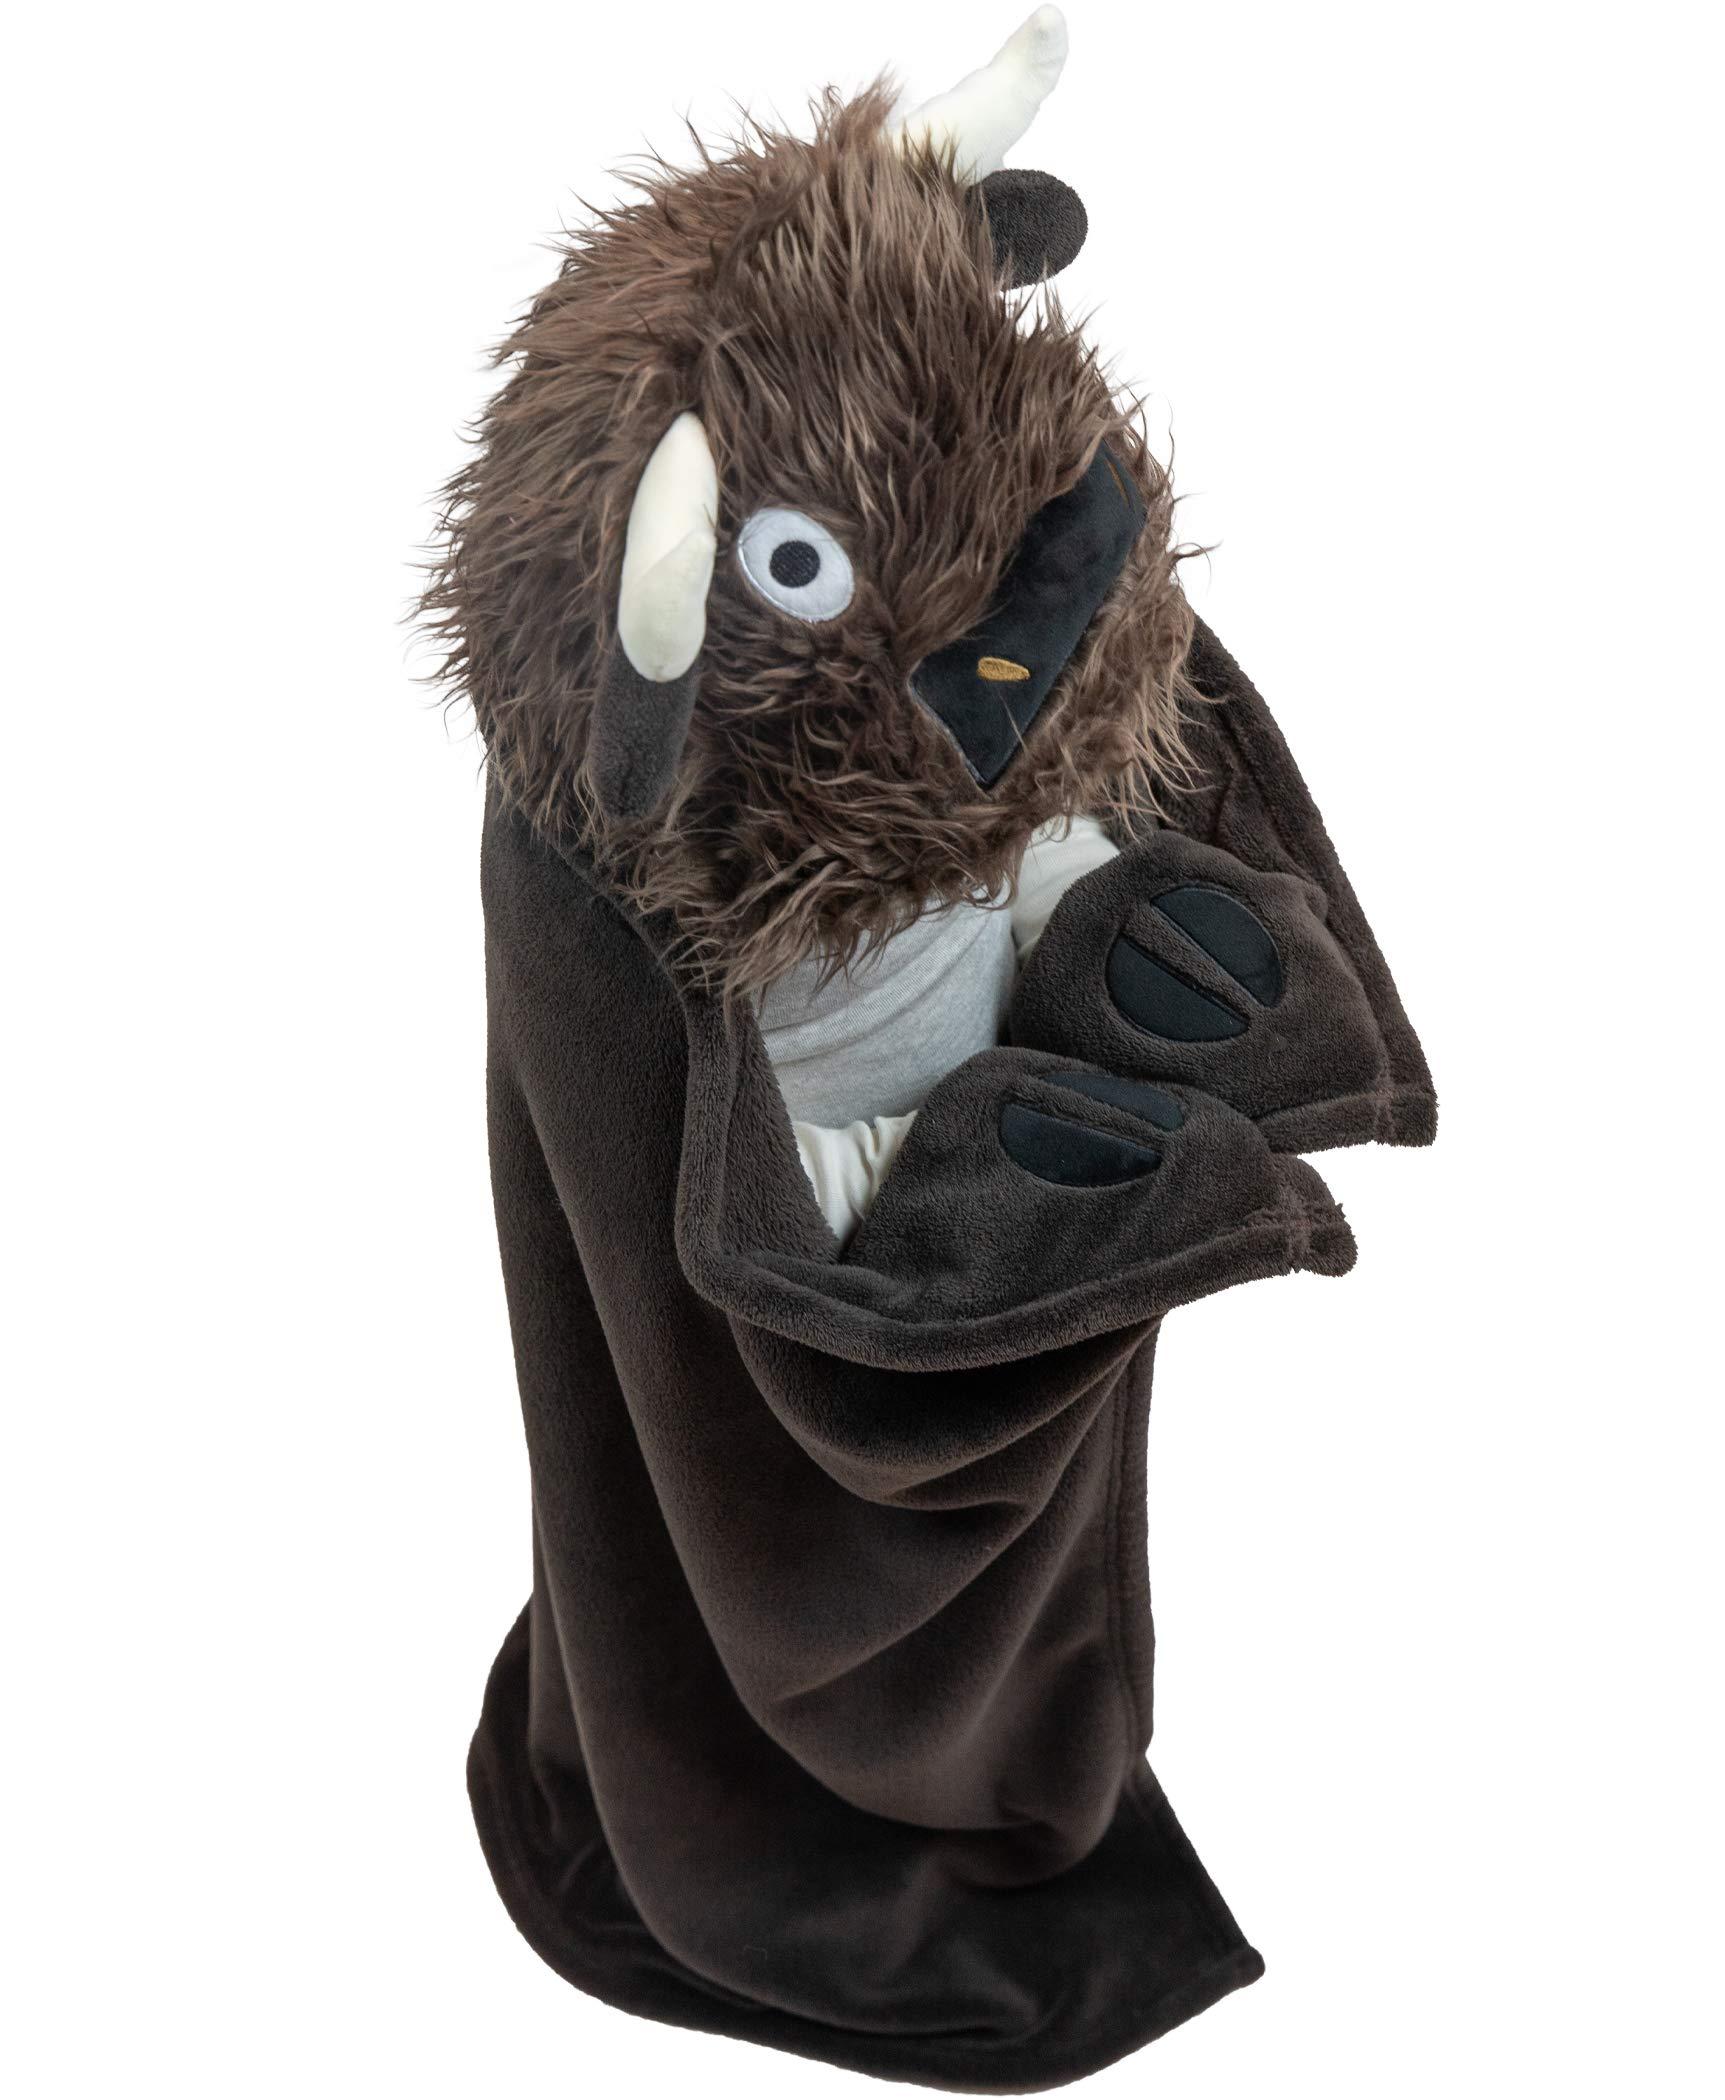 Lazy One Animal Blanket Hoodie for Kids, Hooded Blanket, Wearable Blanket, Soft, Cozy, Warm, Fleece (Buffalo Blanket)